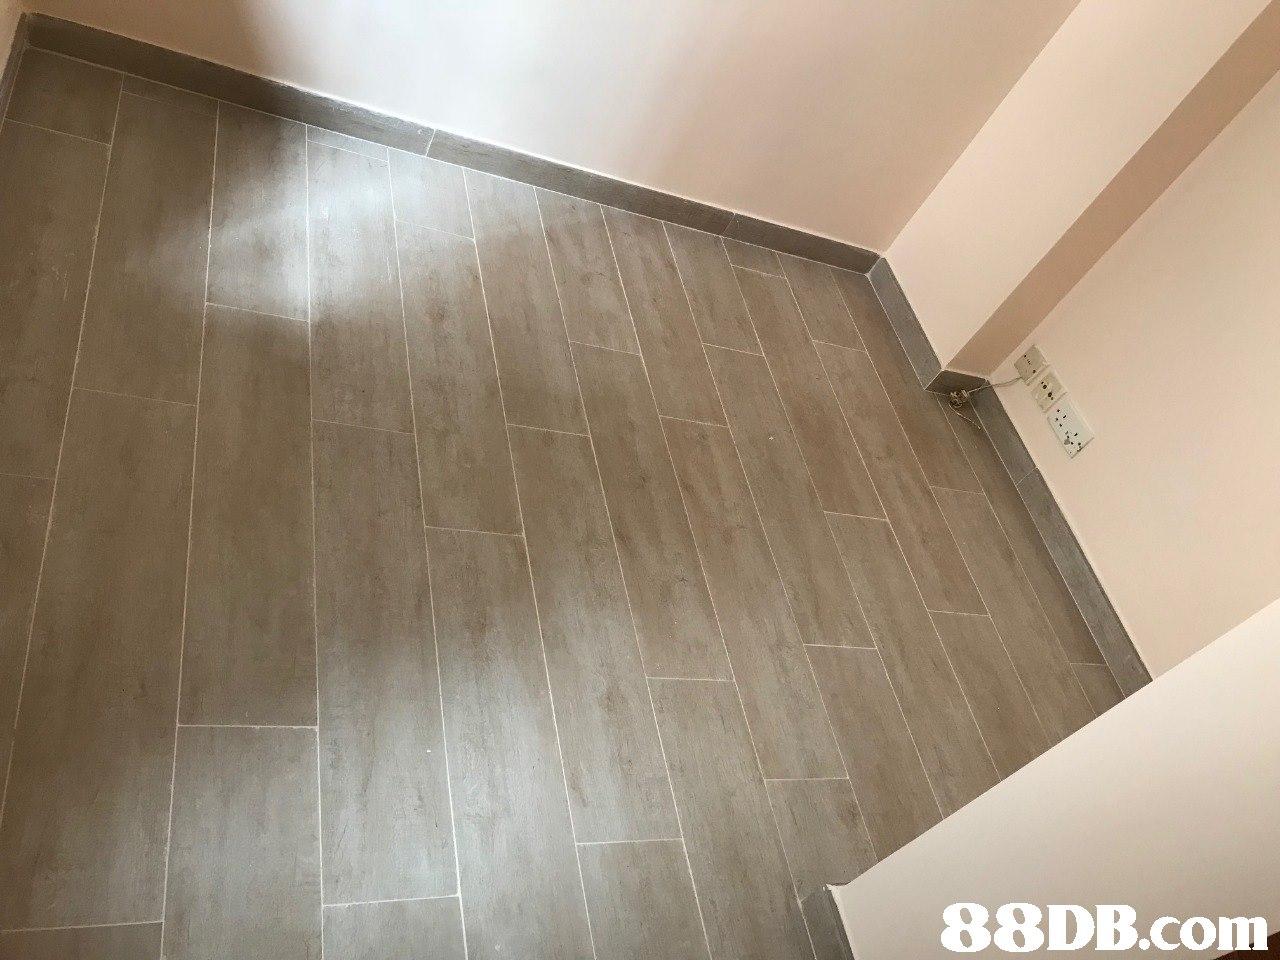 property,floor,flooring,tile,wall